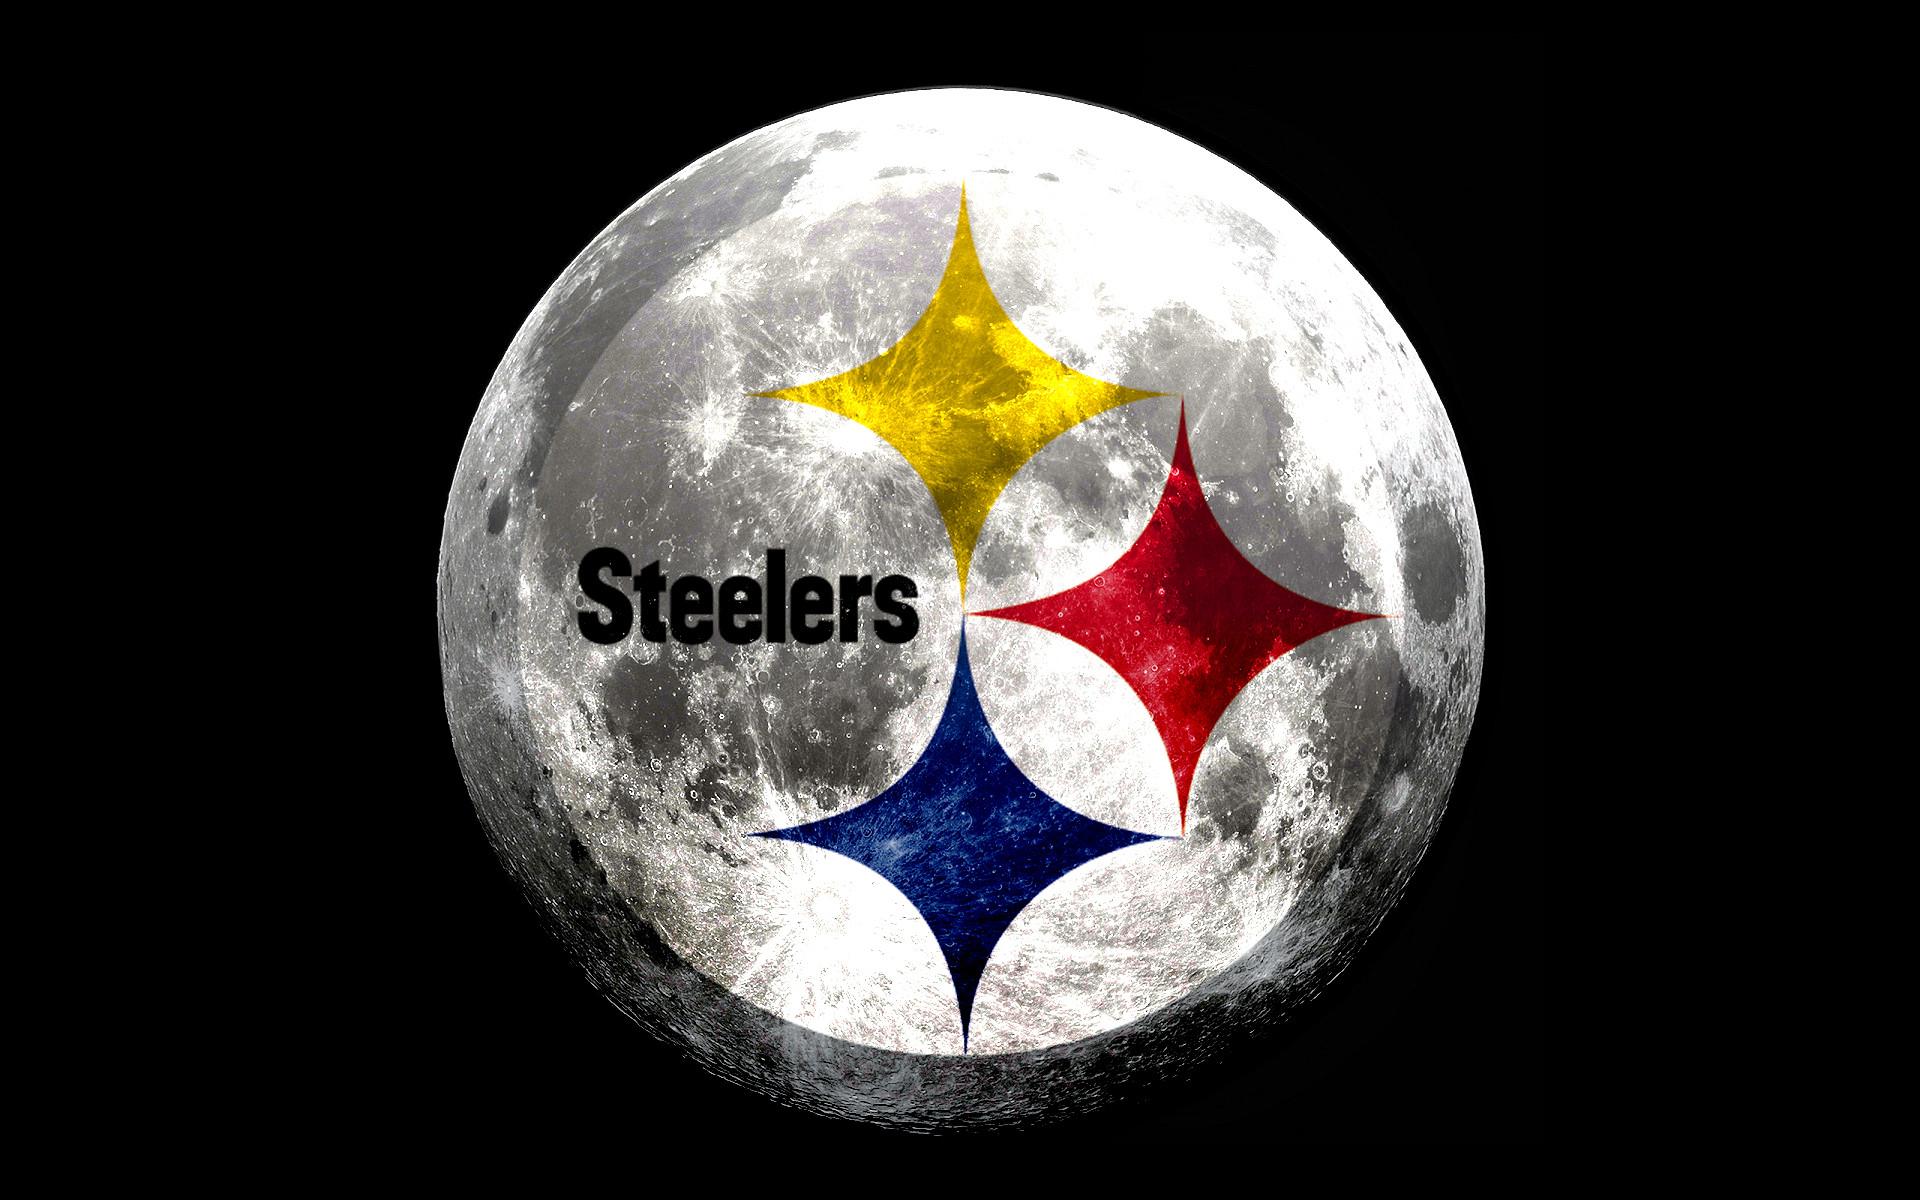 Pittsburgh Steelers Live Wallpaper